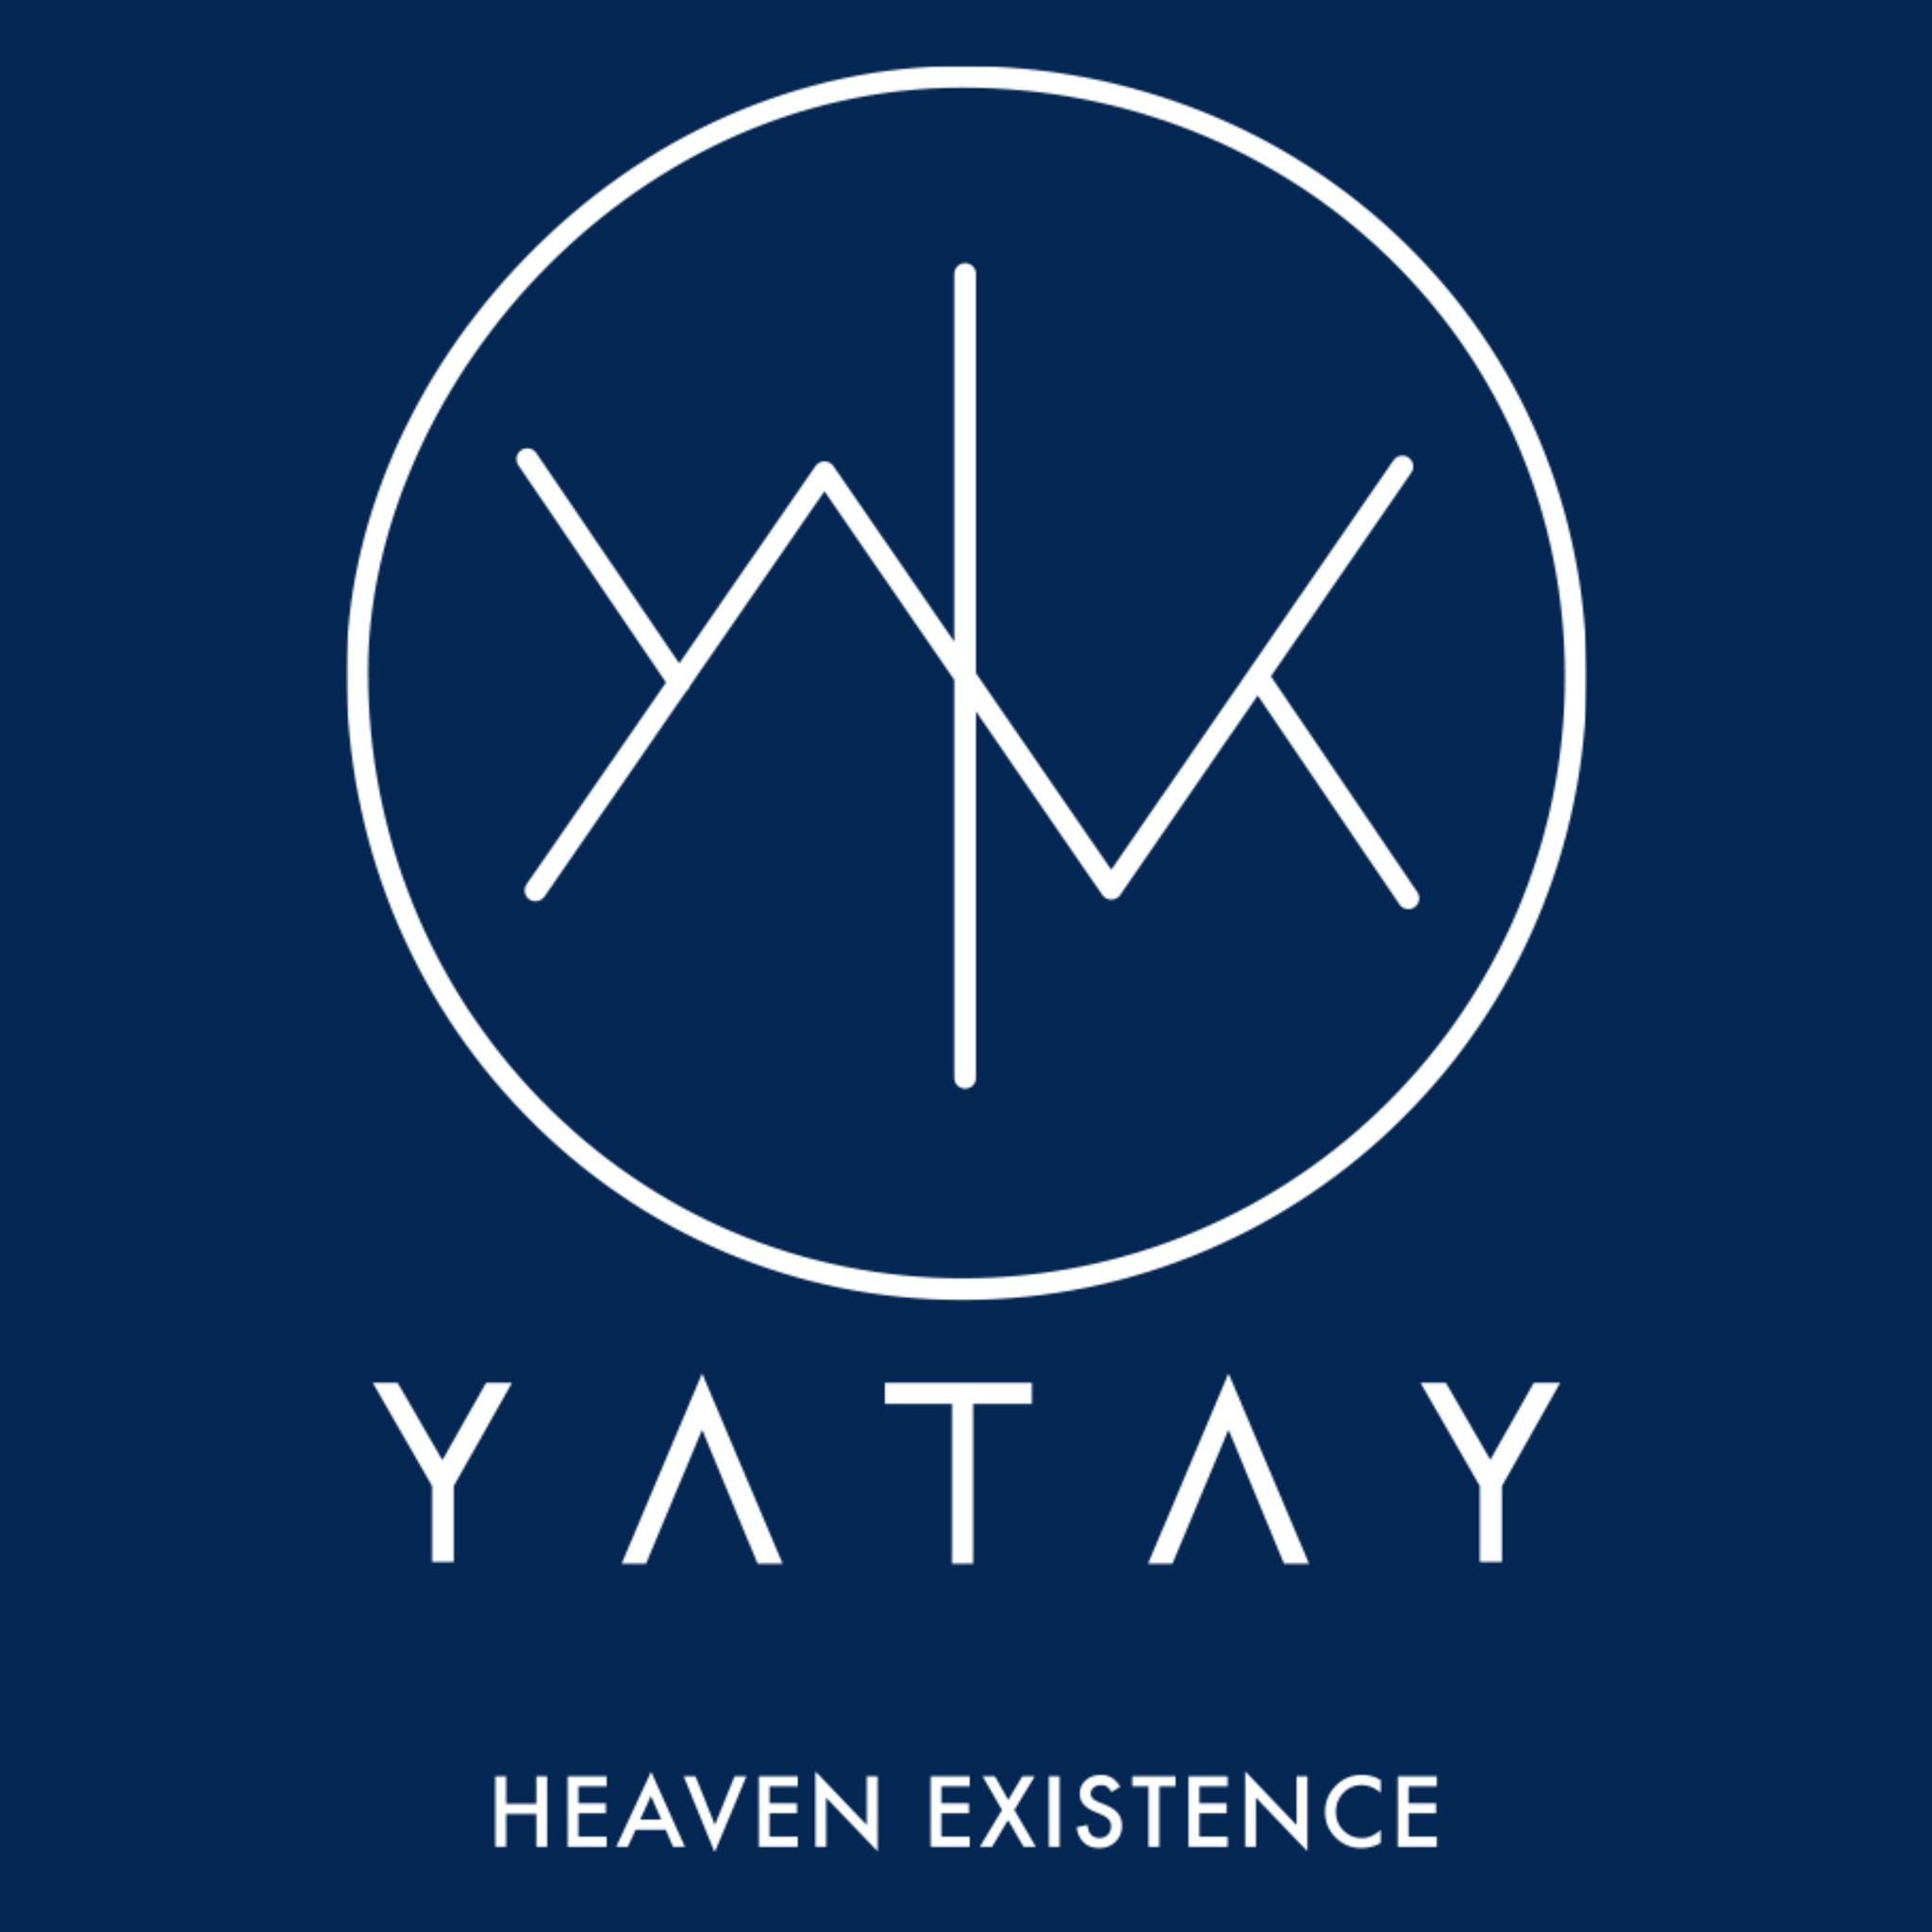 Yatay Towers